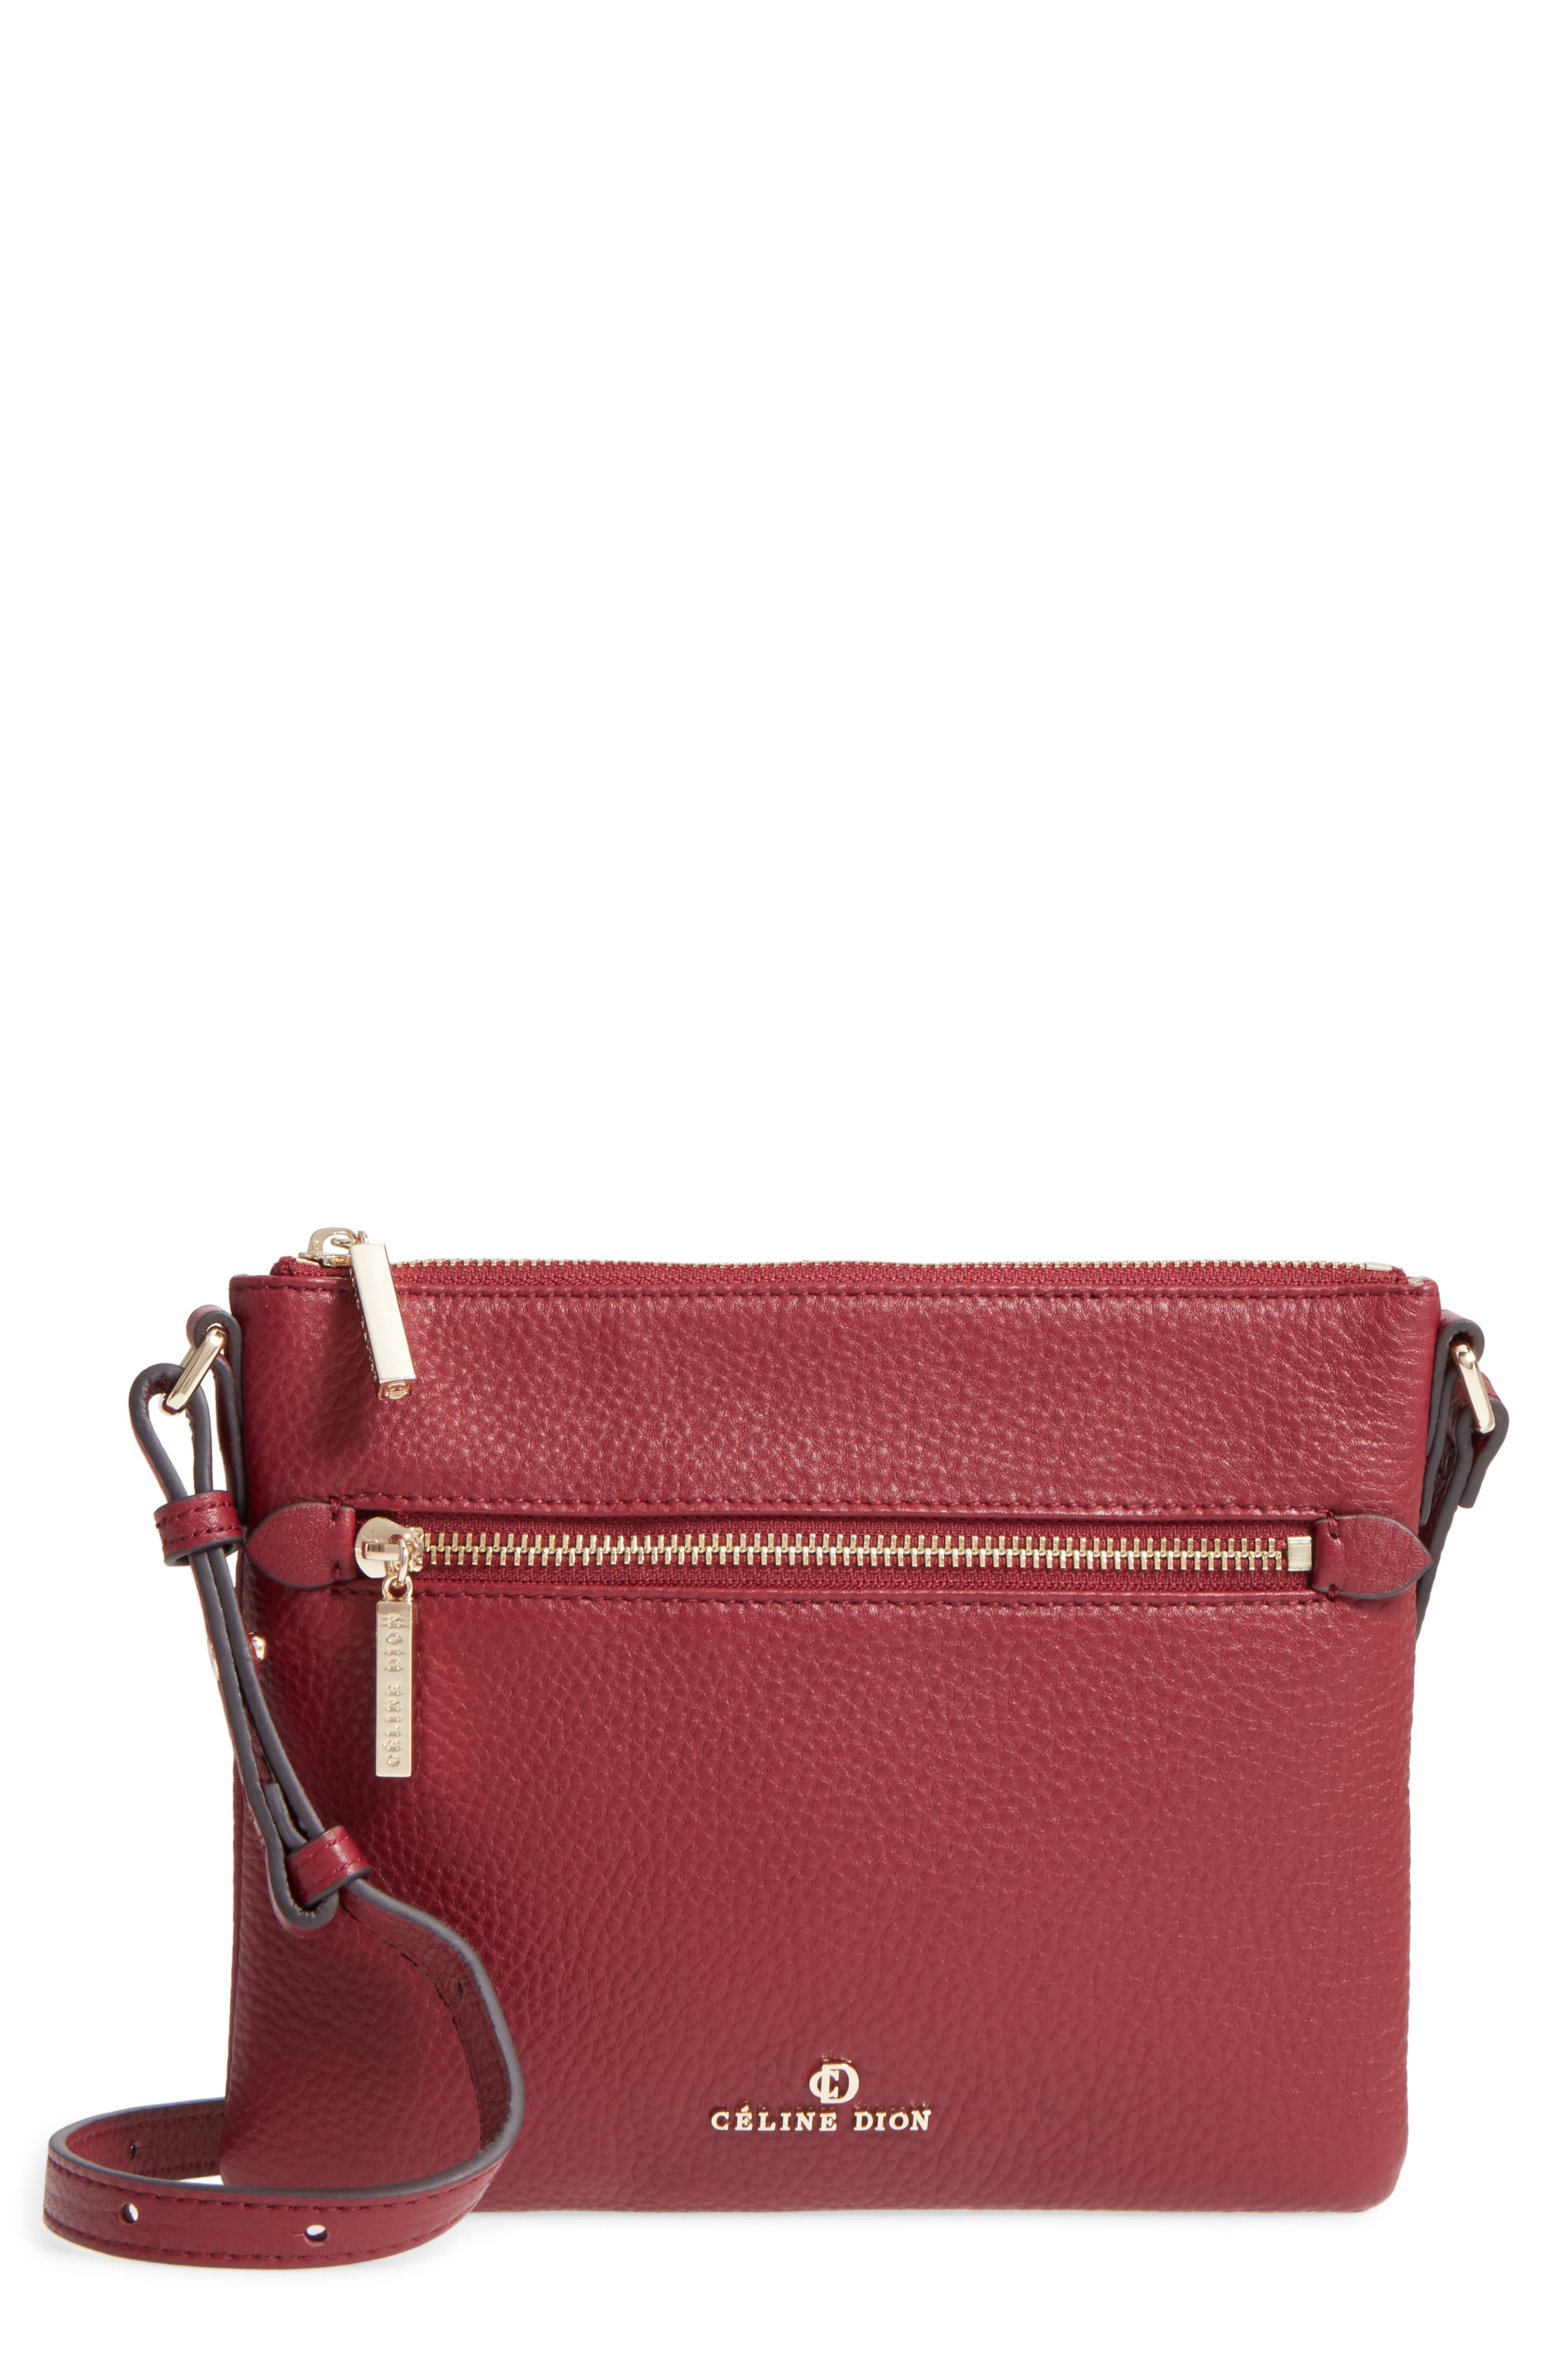 Alternate Image 1 Selected - Céline Dion Adagio Leather Crossbody Bag